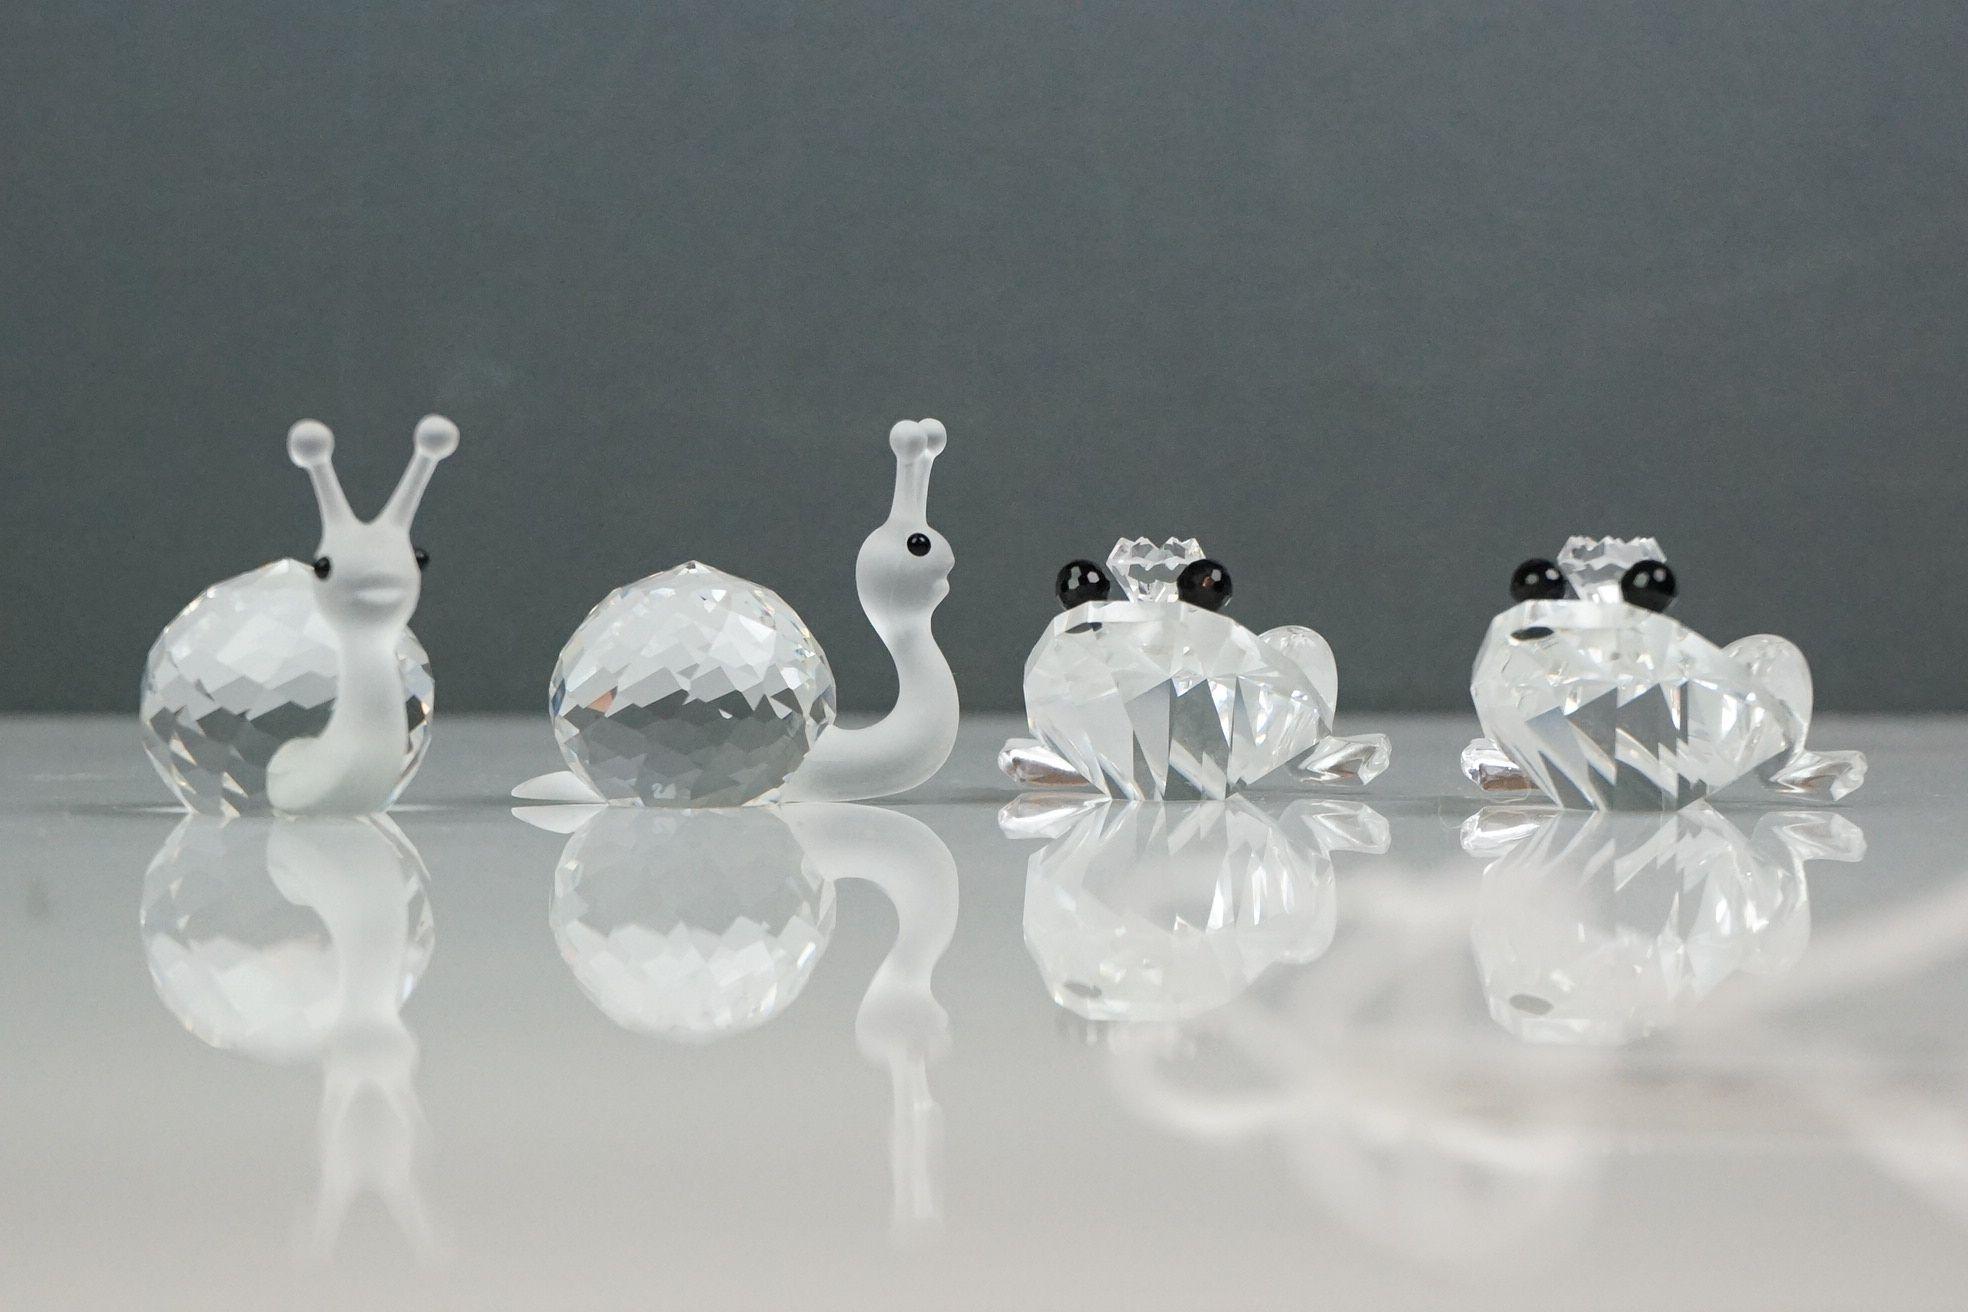 Two Swarovski crystal snails and two Swarovski crystal frogs (2)